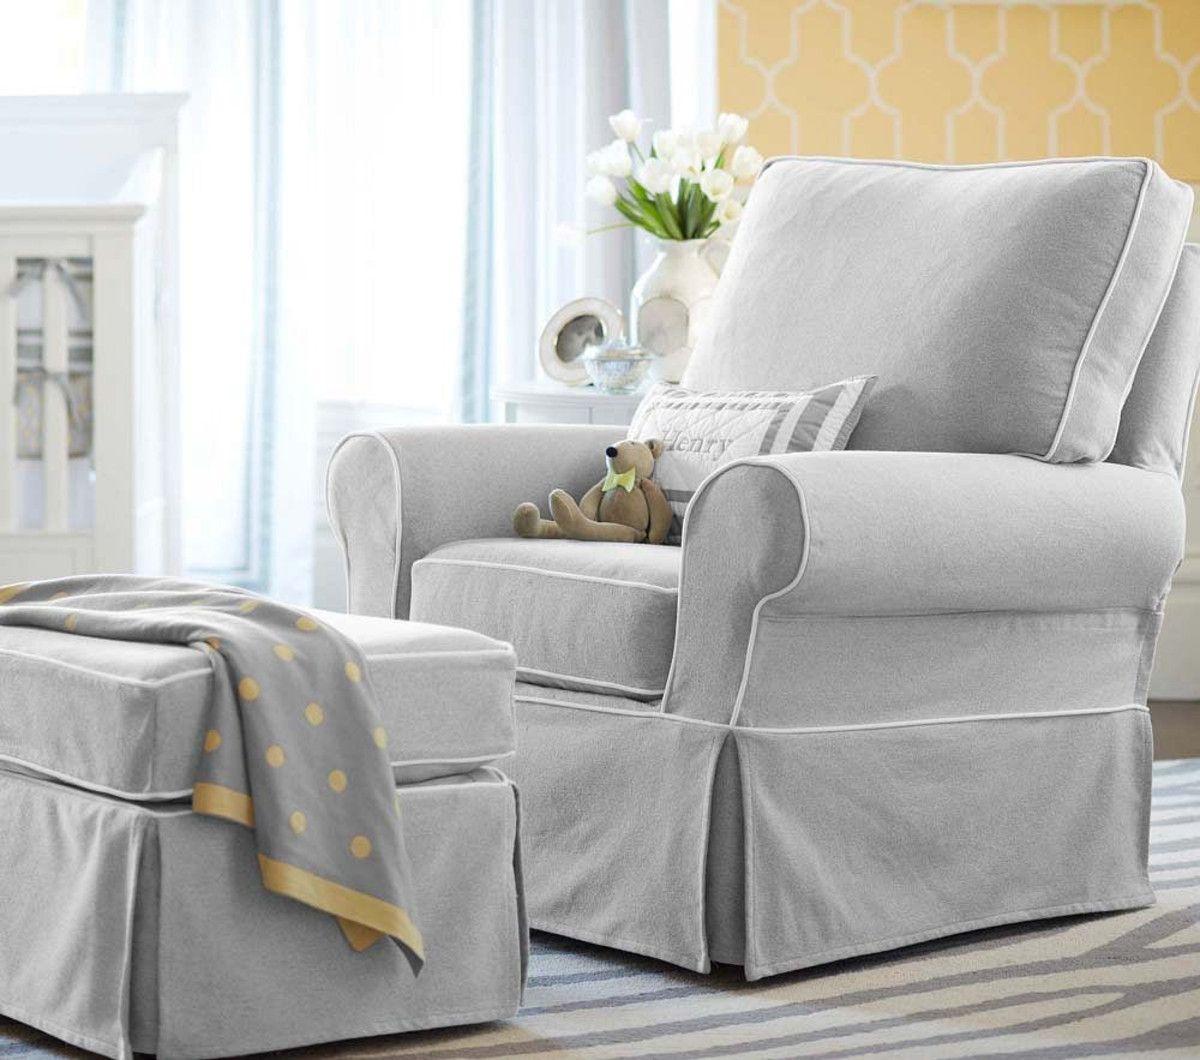 Pottery Barn Baby Rocking Chair Finn Juhl 45 Replica The Most Comfortable Nursing And Ottoman Comfort